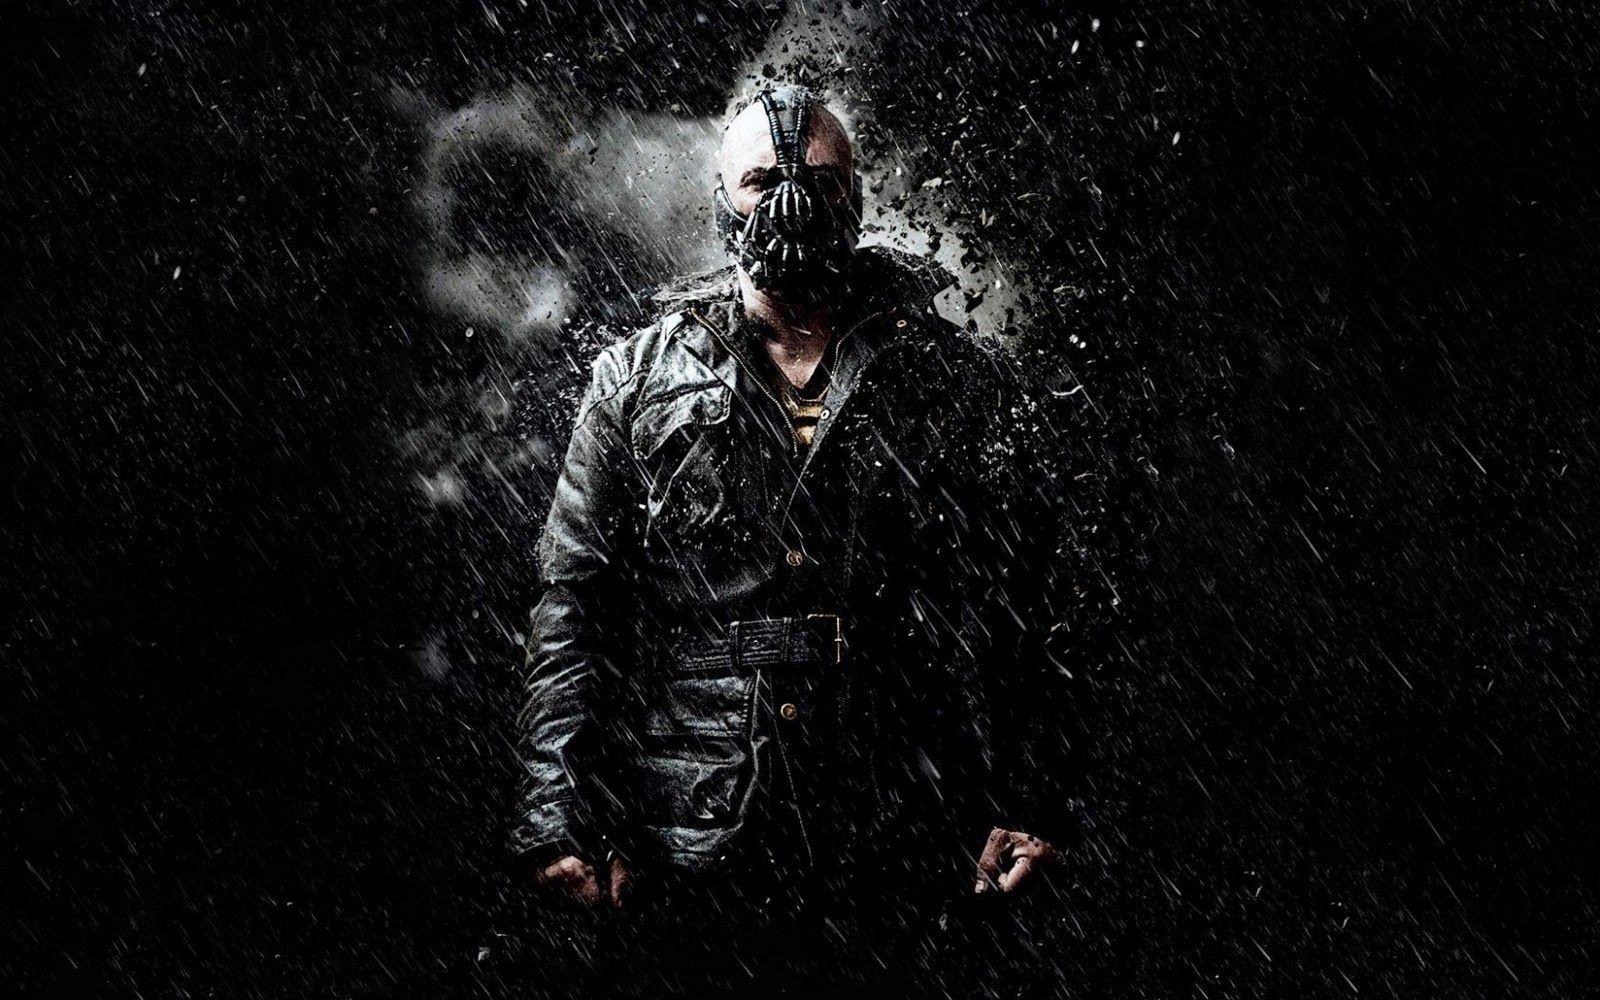 1600x1000 Bane The Dark Knight Rises Legend Superhero Comics HD Desktop